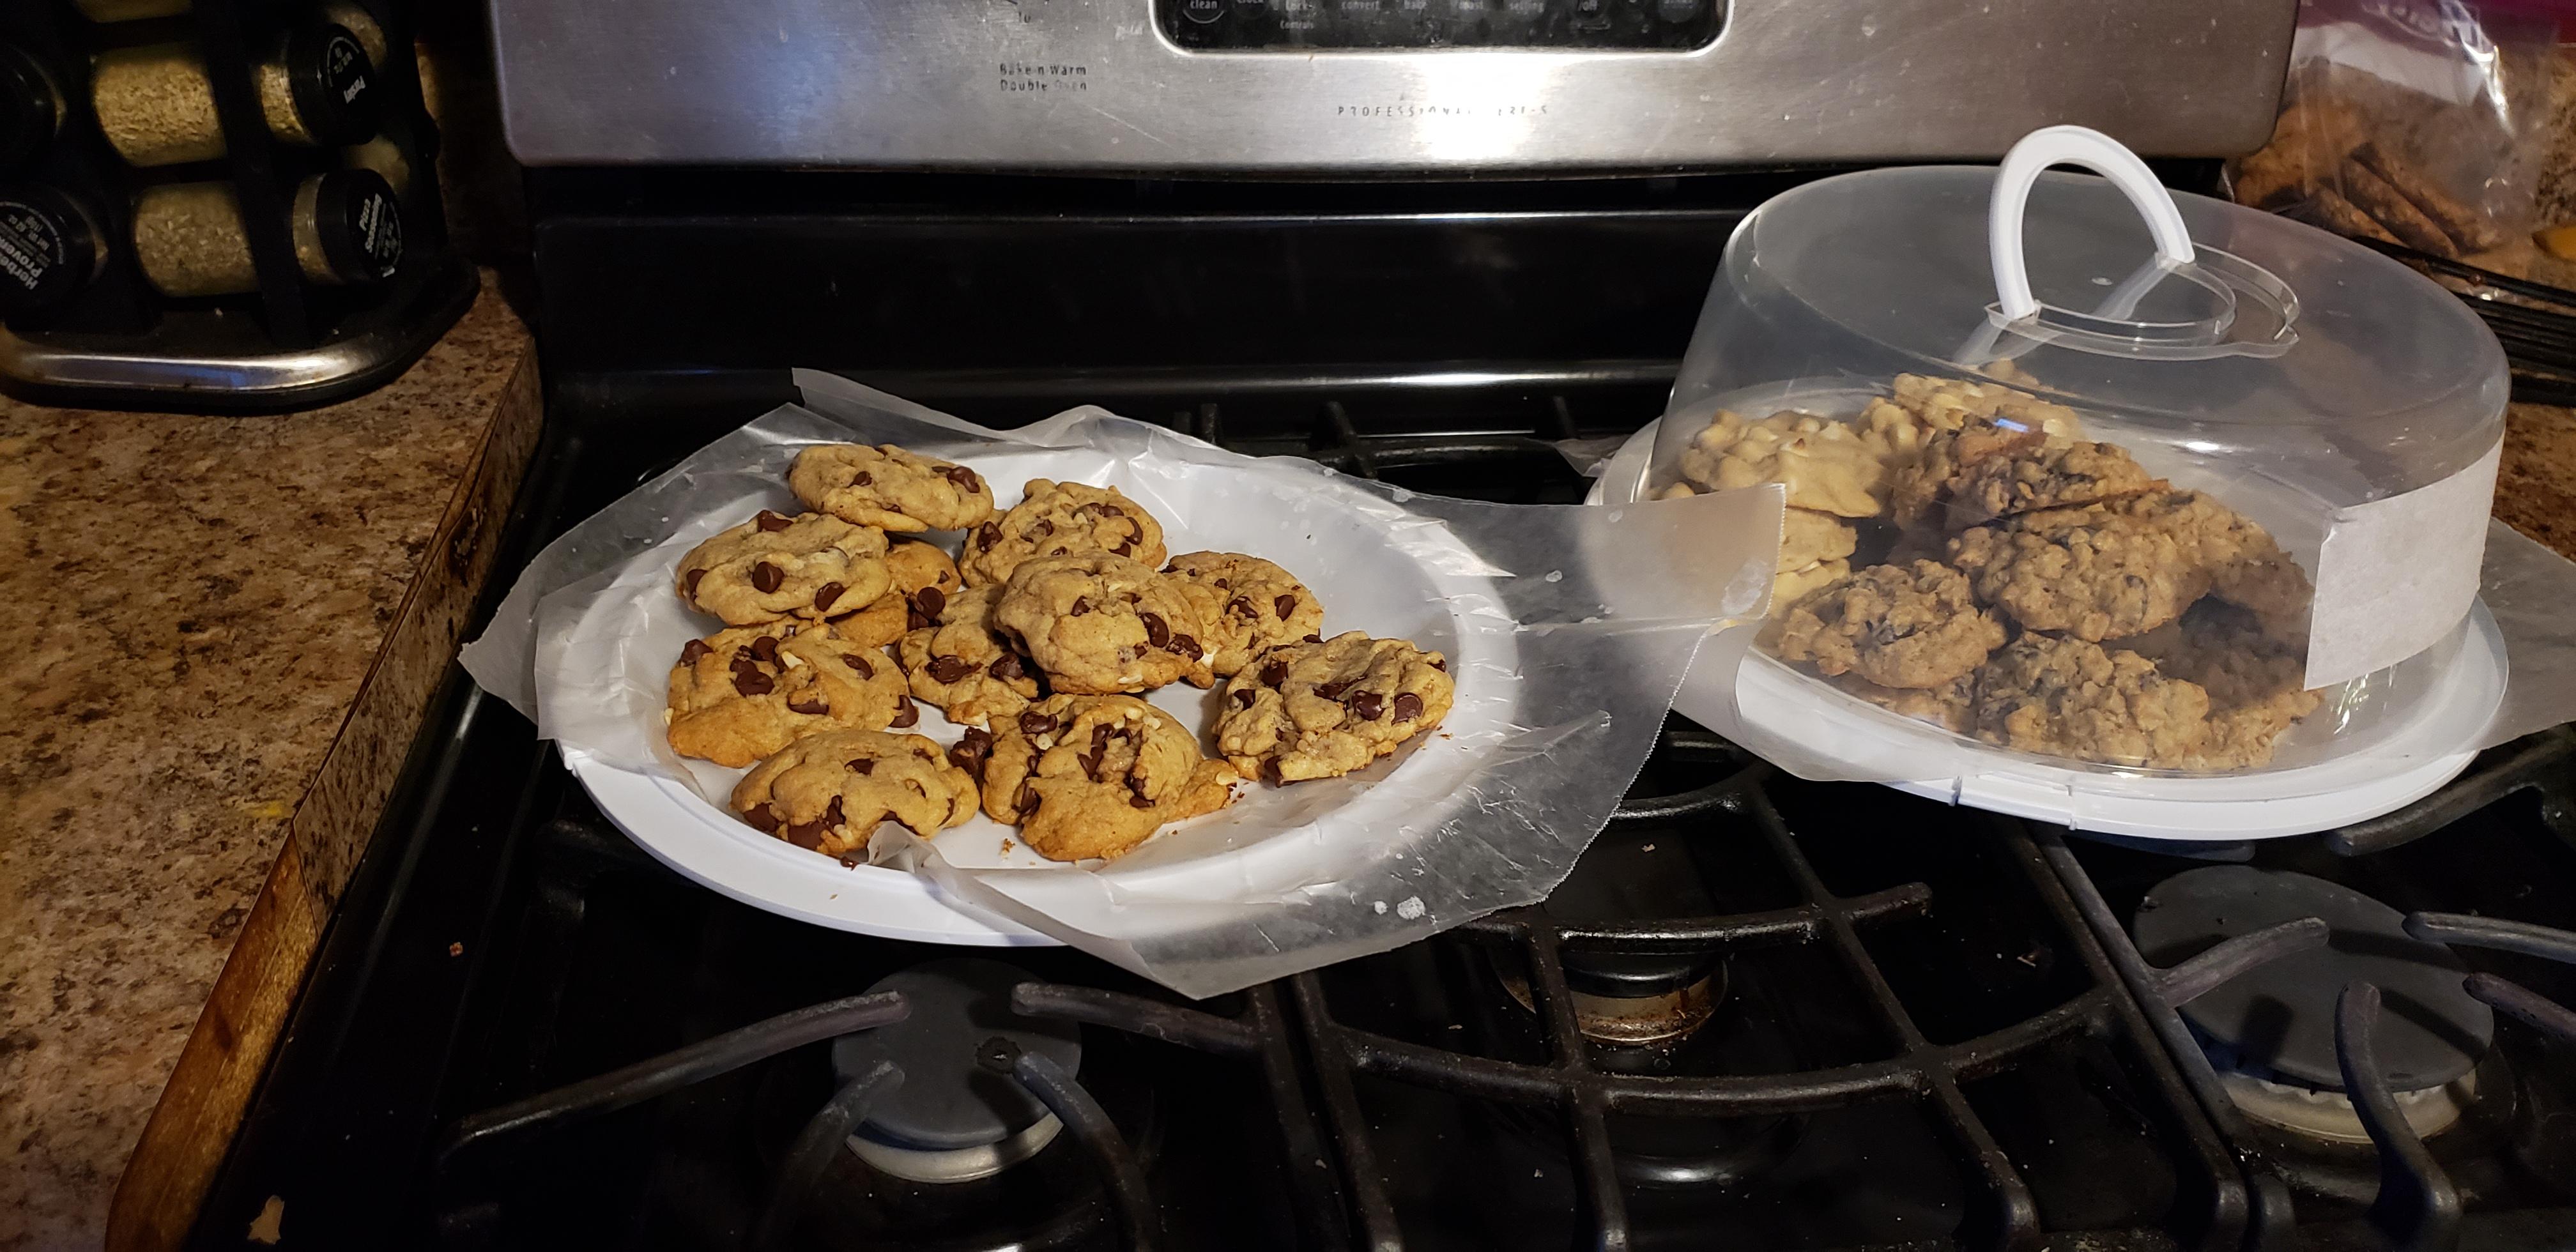 Tiffany's Chocolate Chip Cookies